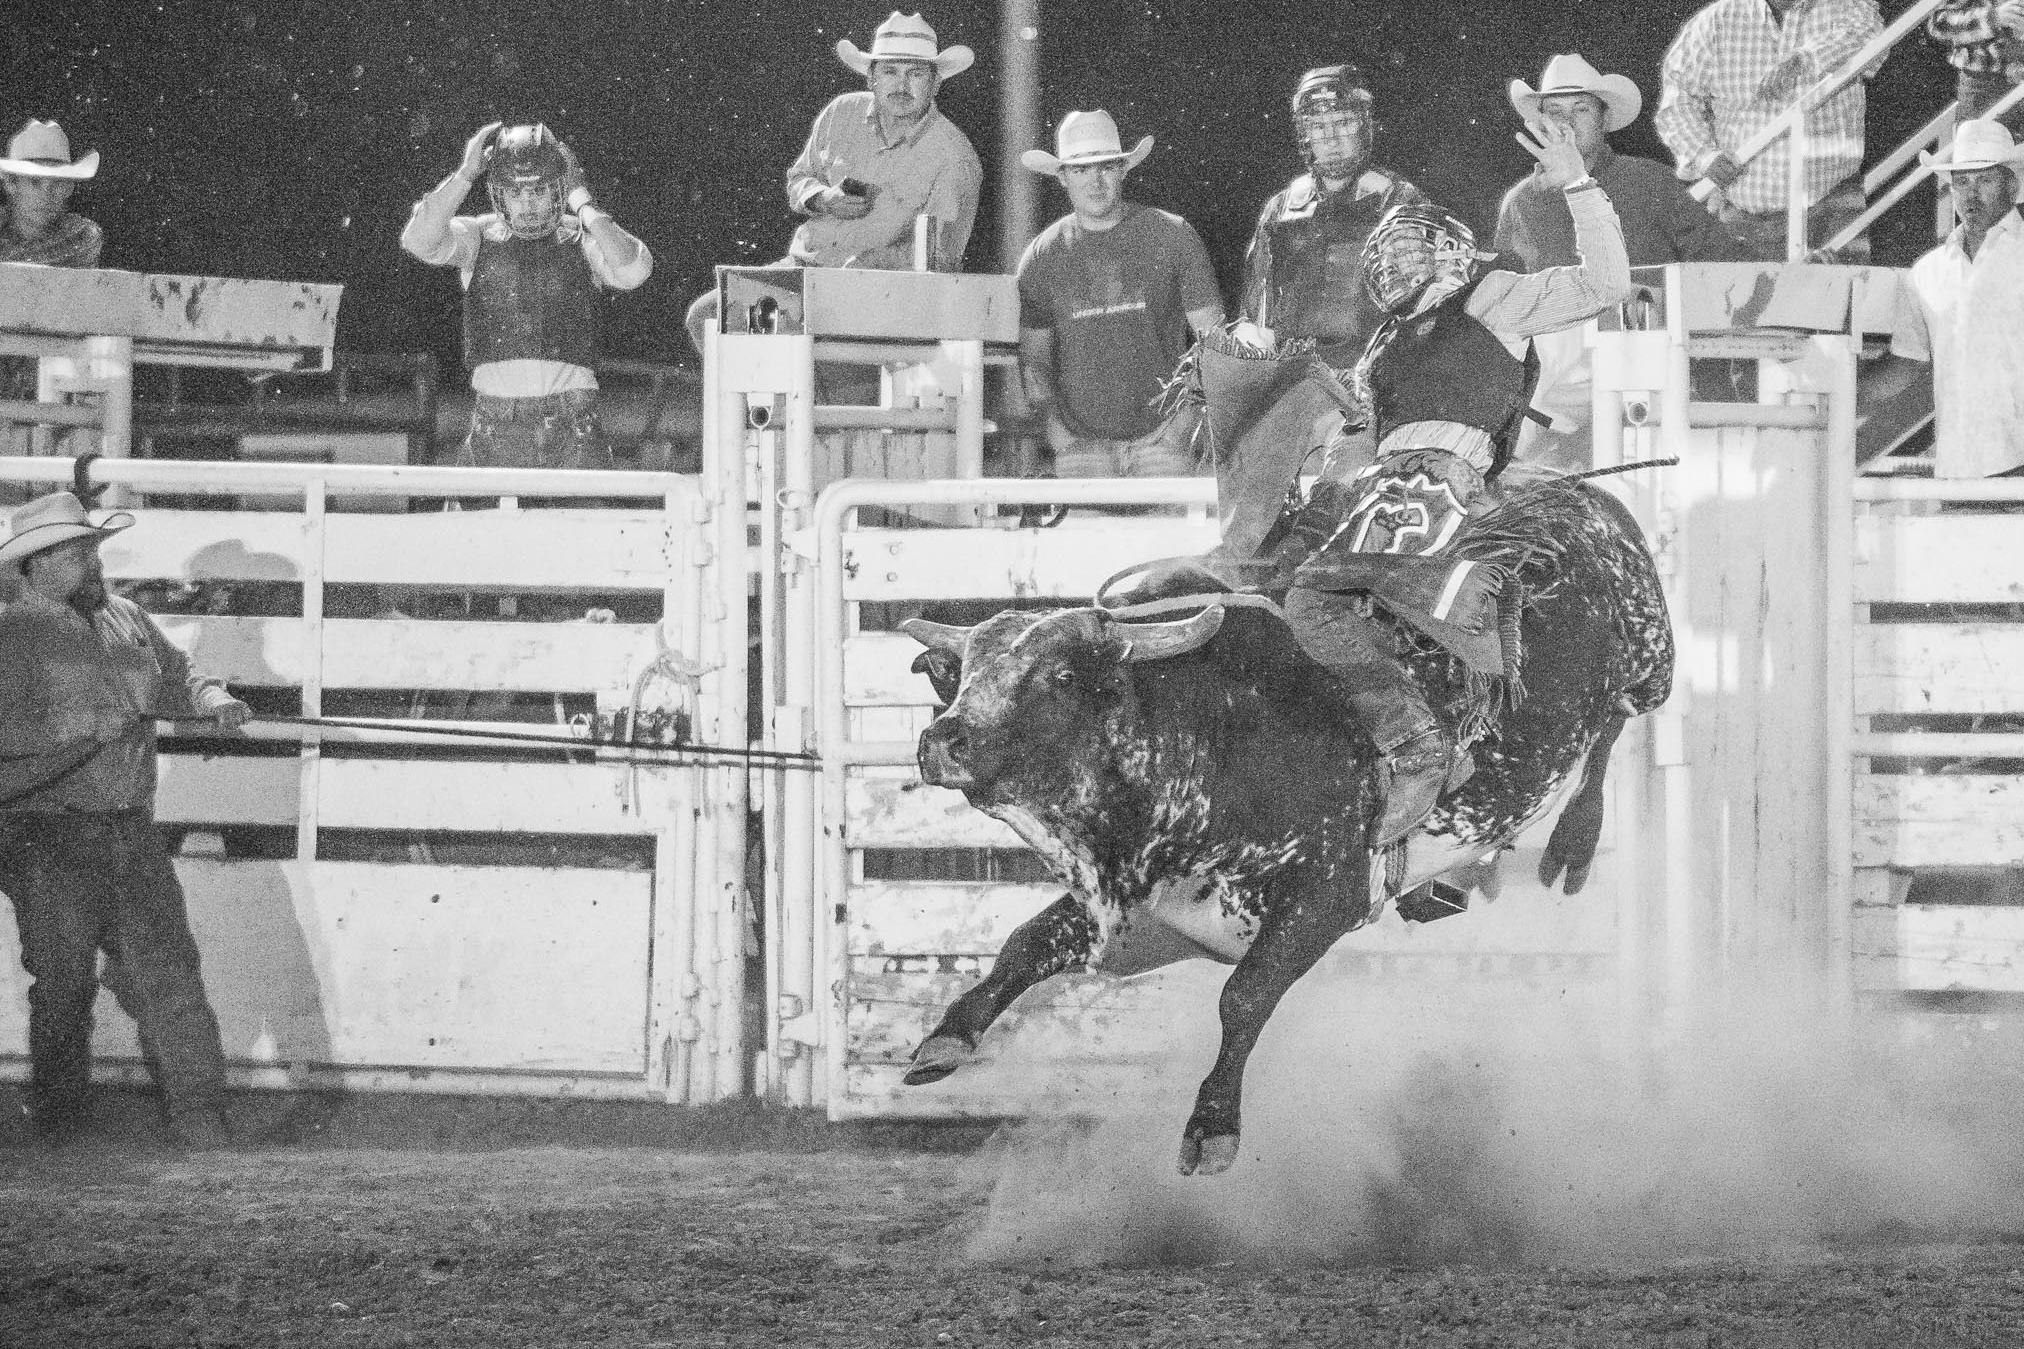 Bull Rider. © Tony Bynum